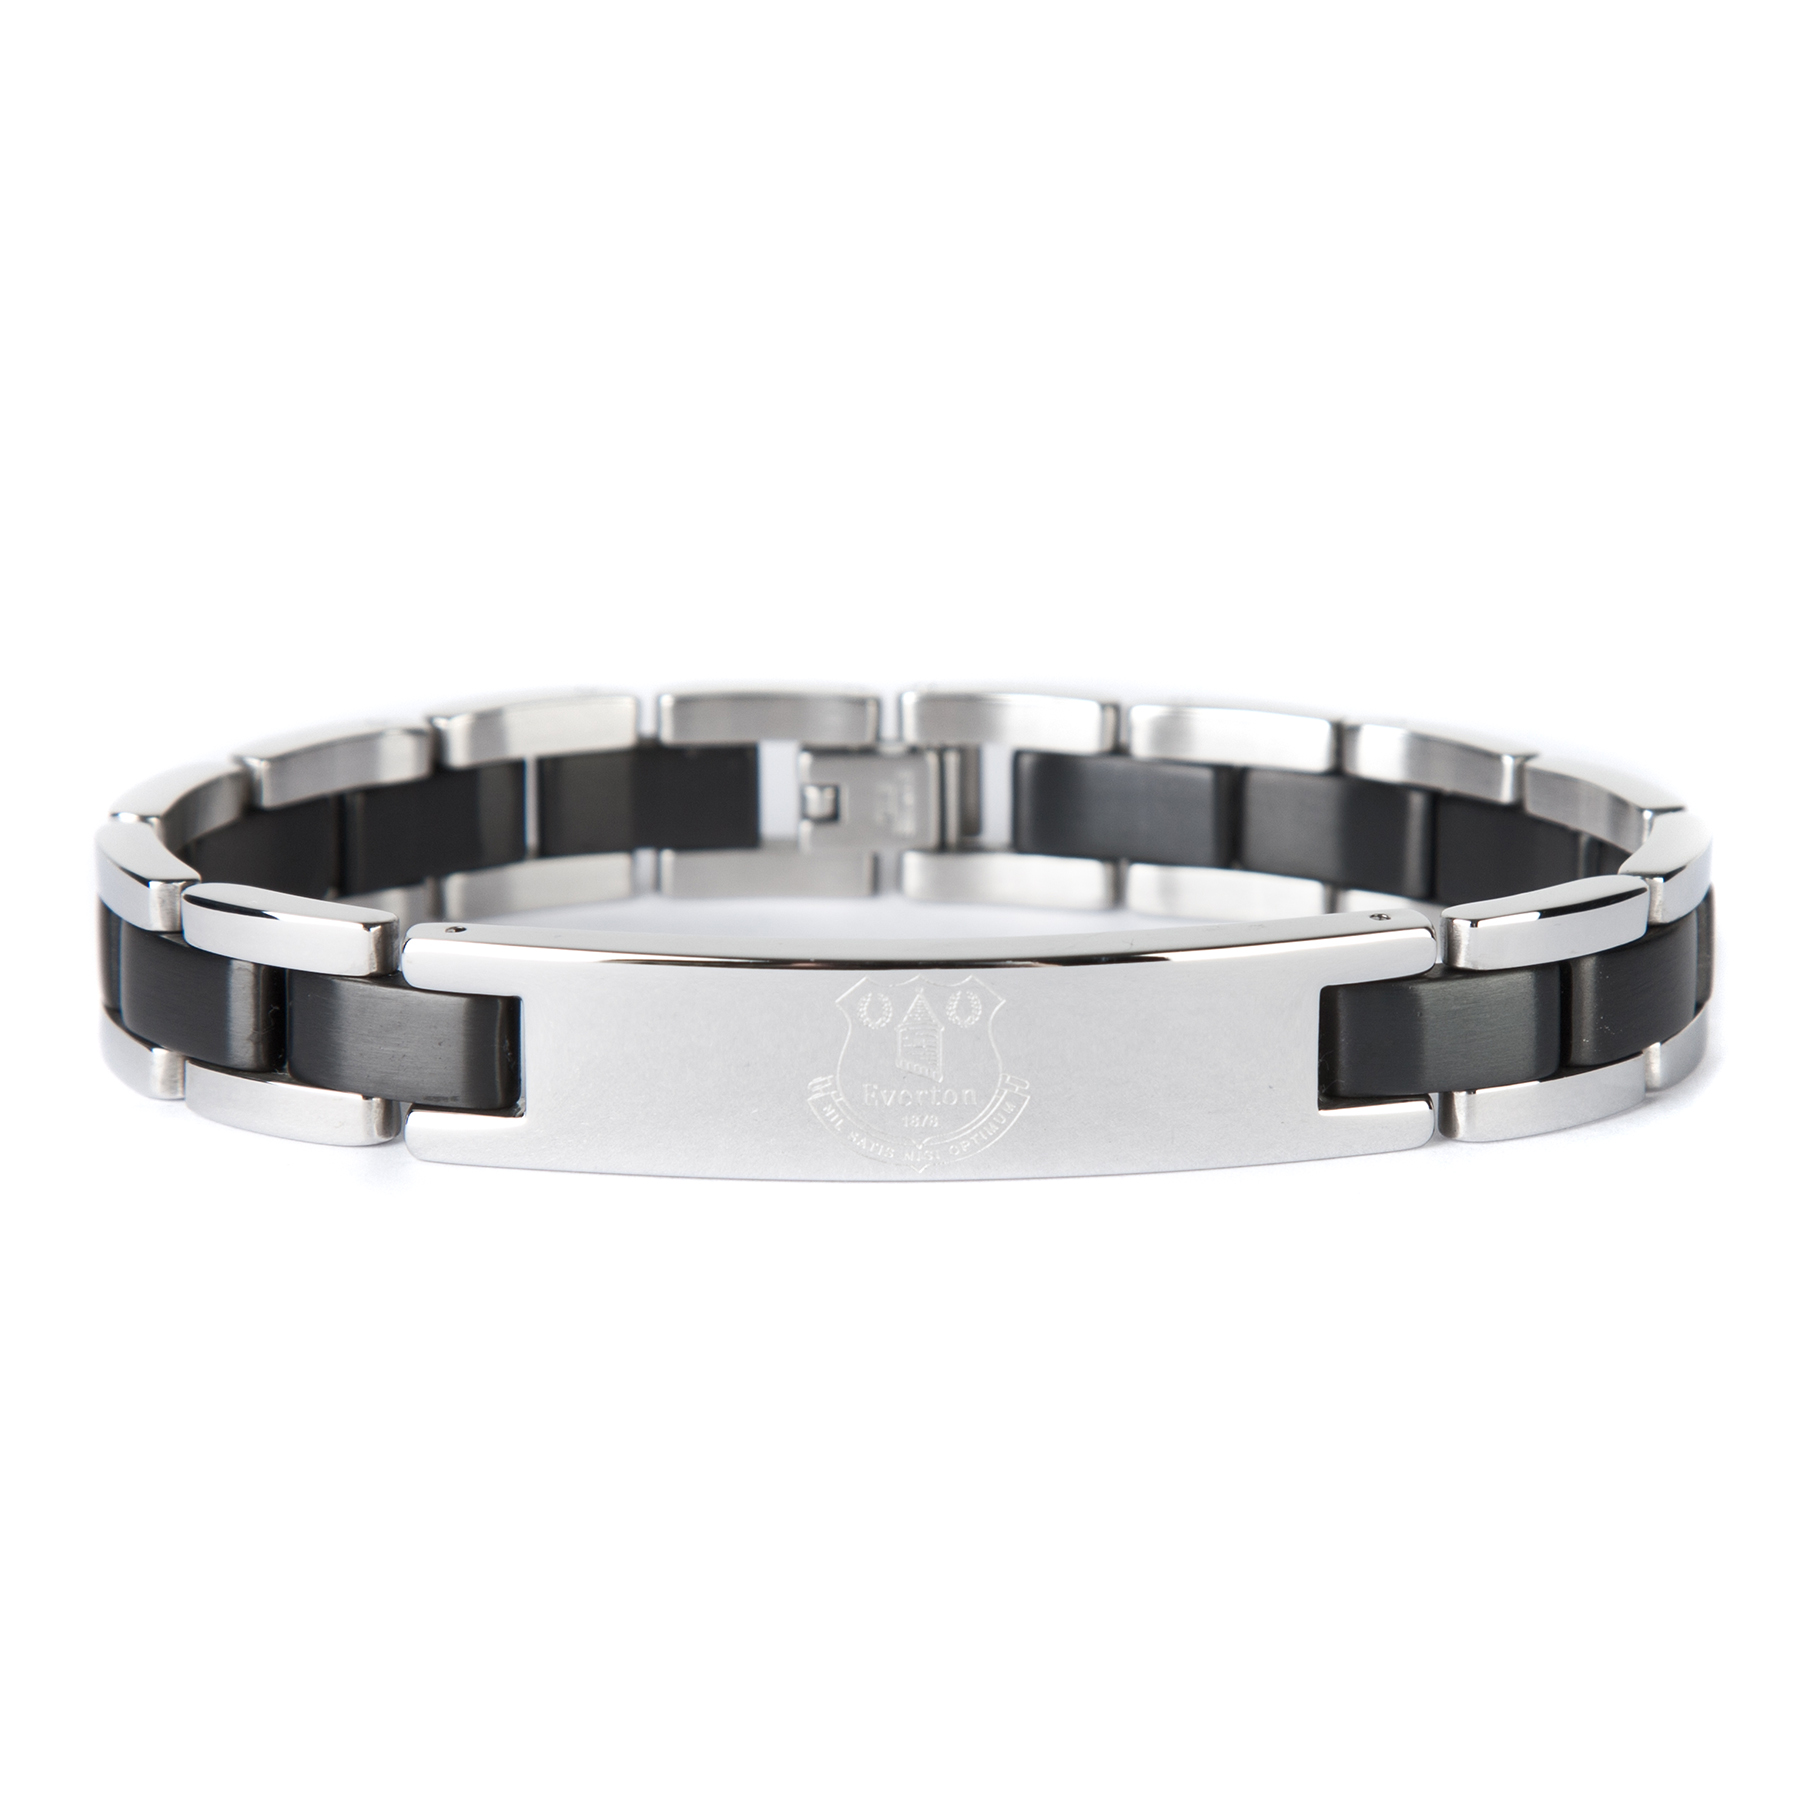 Everton Black Inlay Crest Bracelet